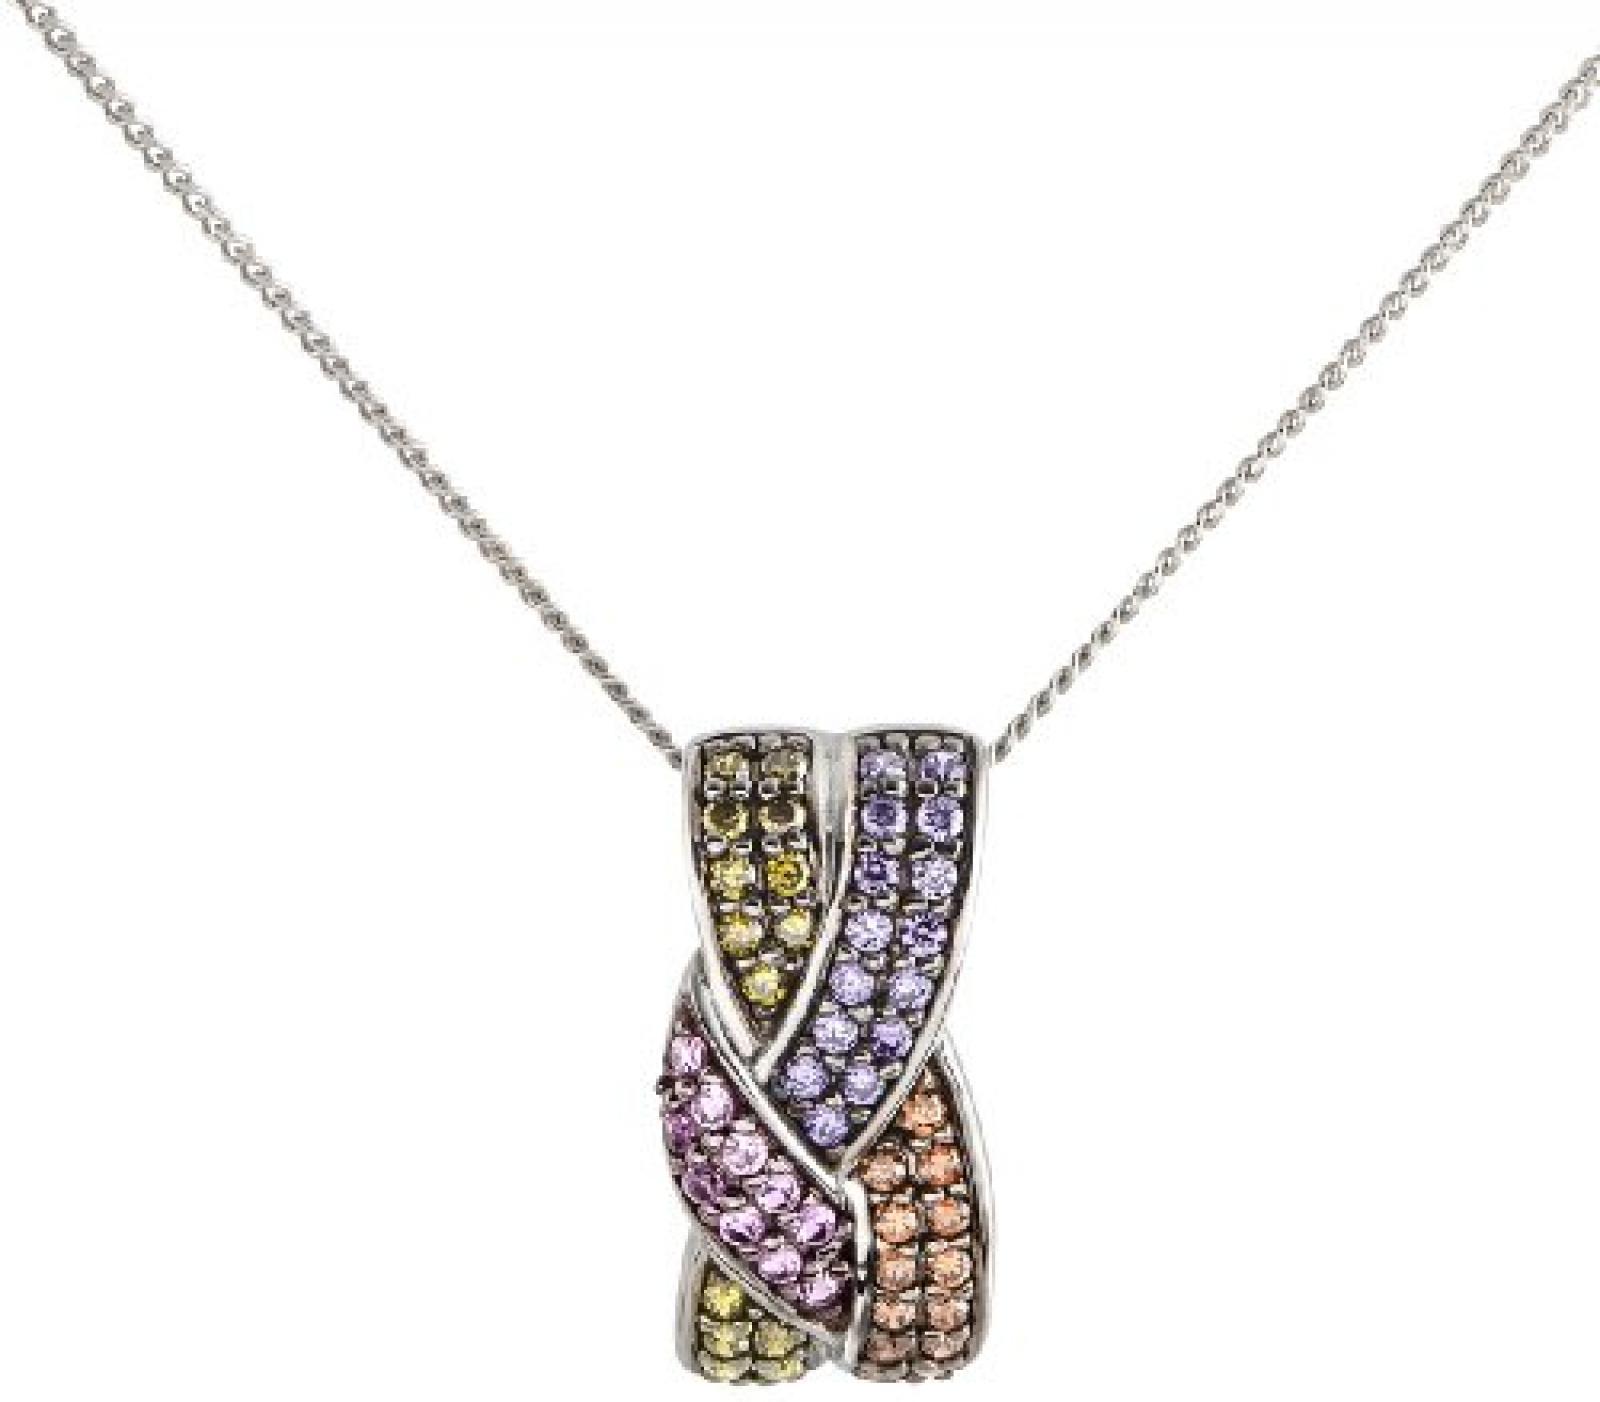 Celesta Damen Halskette 925 Sterling Silber rhodiniert Zirkonia Celesta Silver 42 cm grün mehrfarbig 500244581-42L